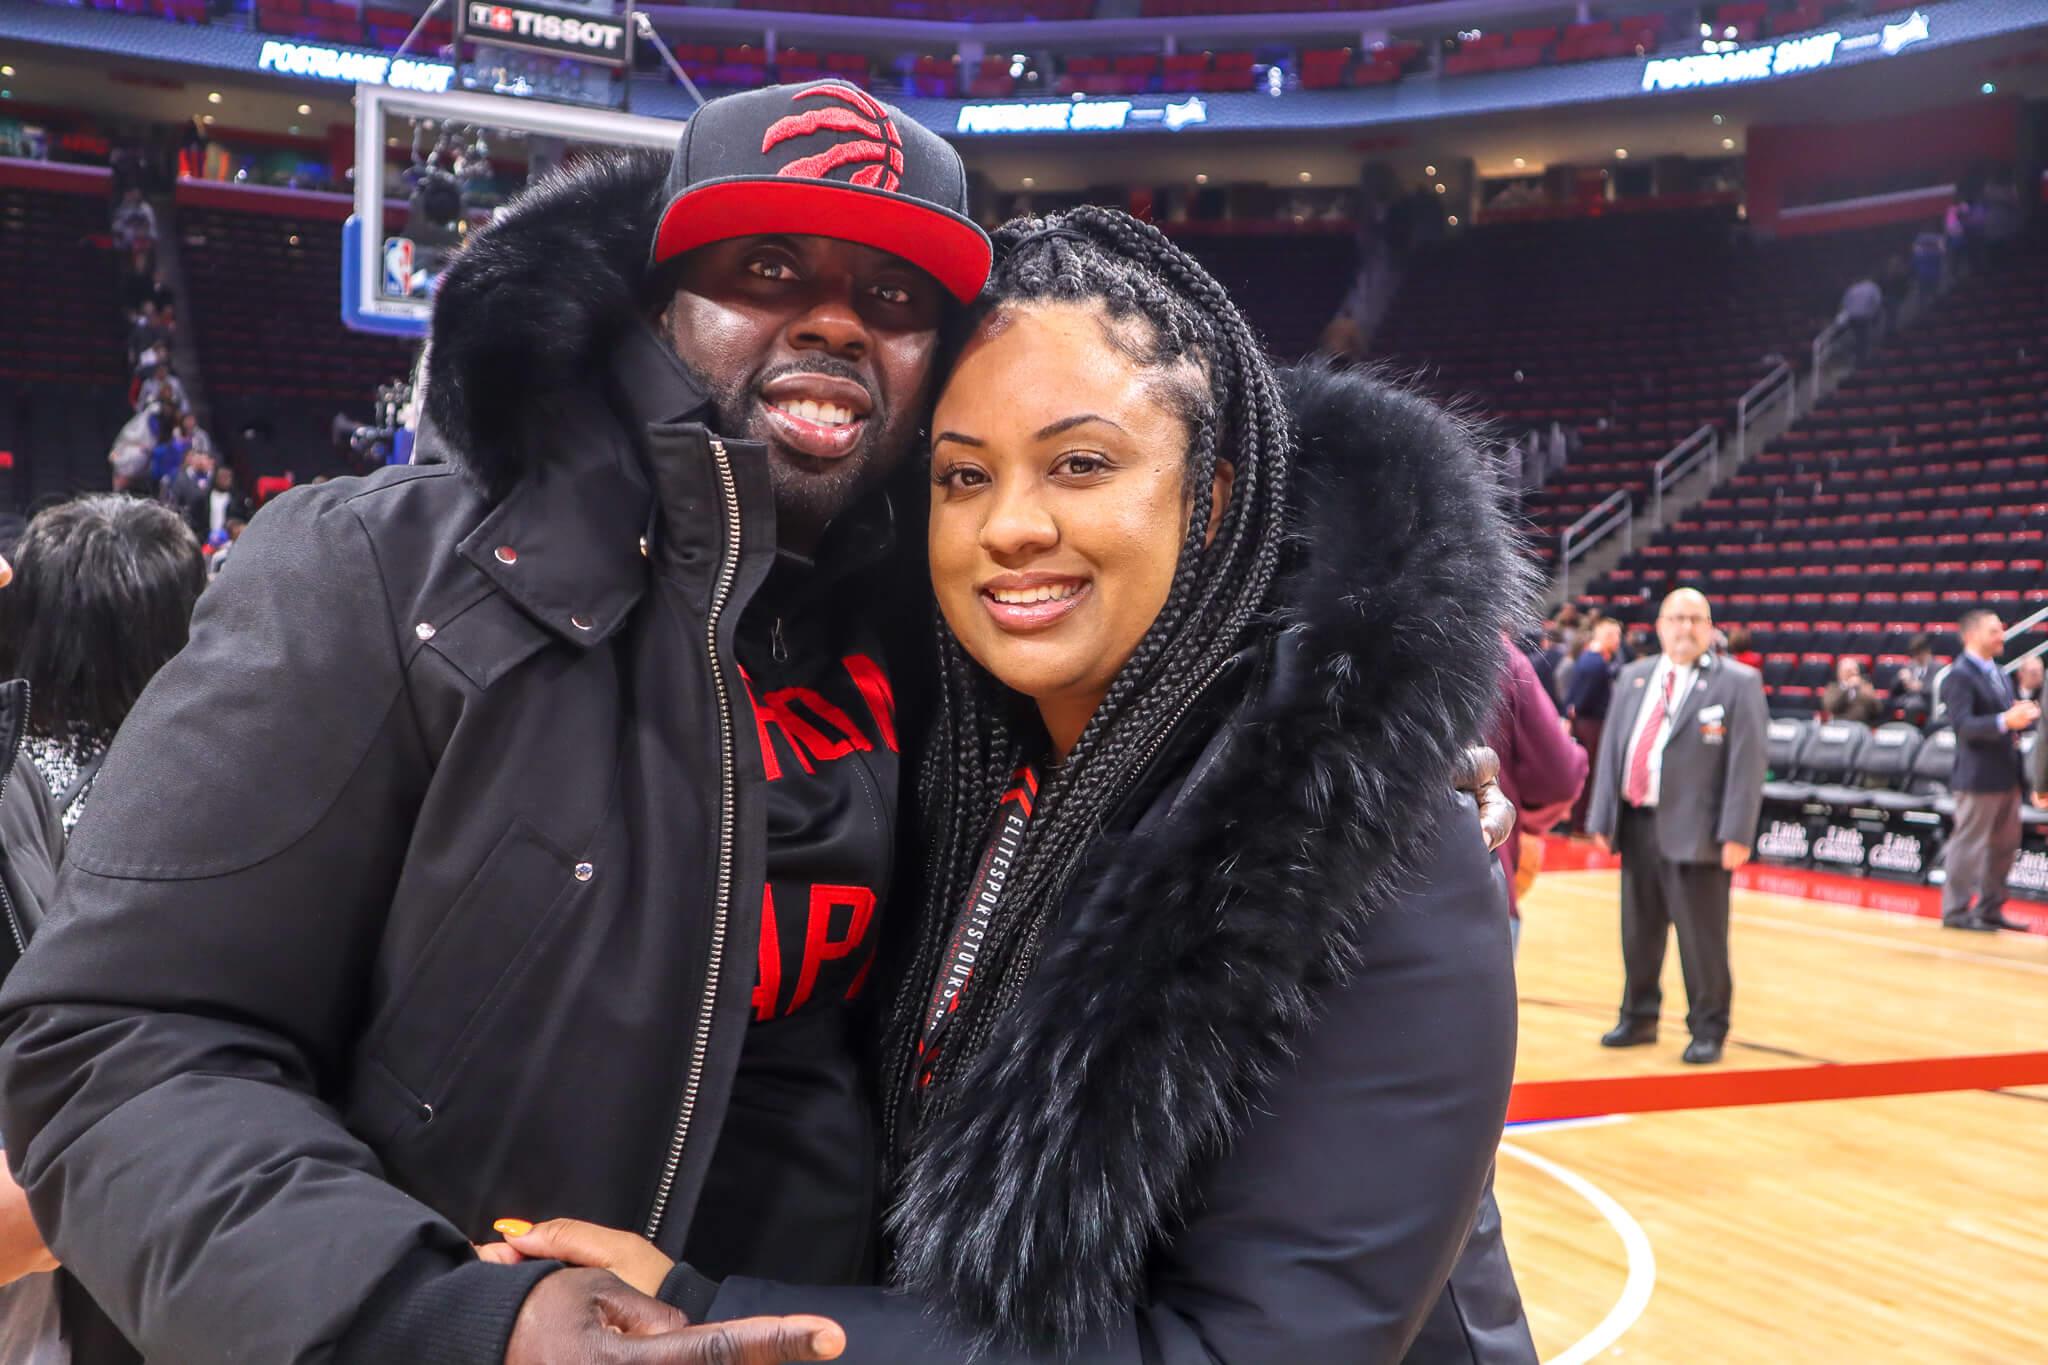 Toronto Raptors vs Detroit Pistons Bus Trip